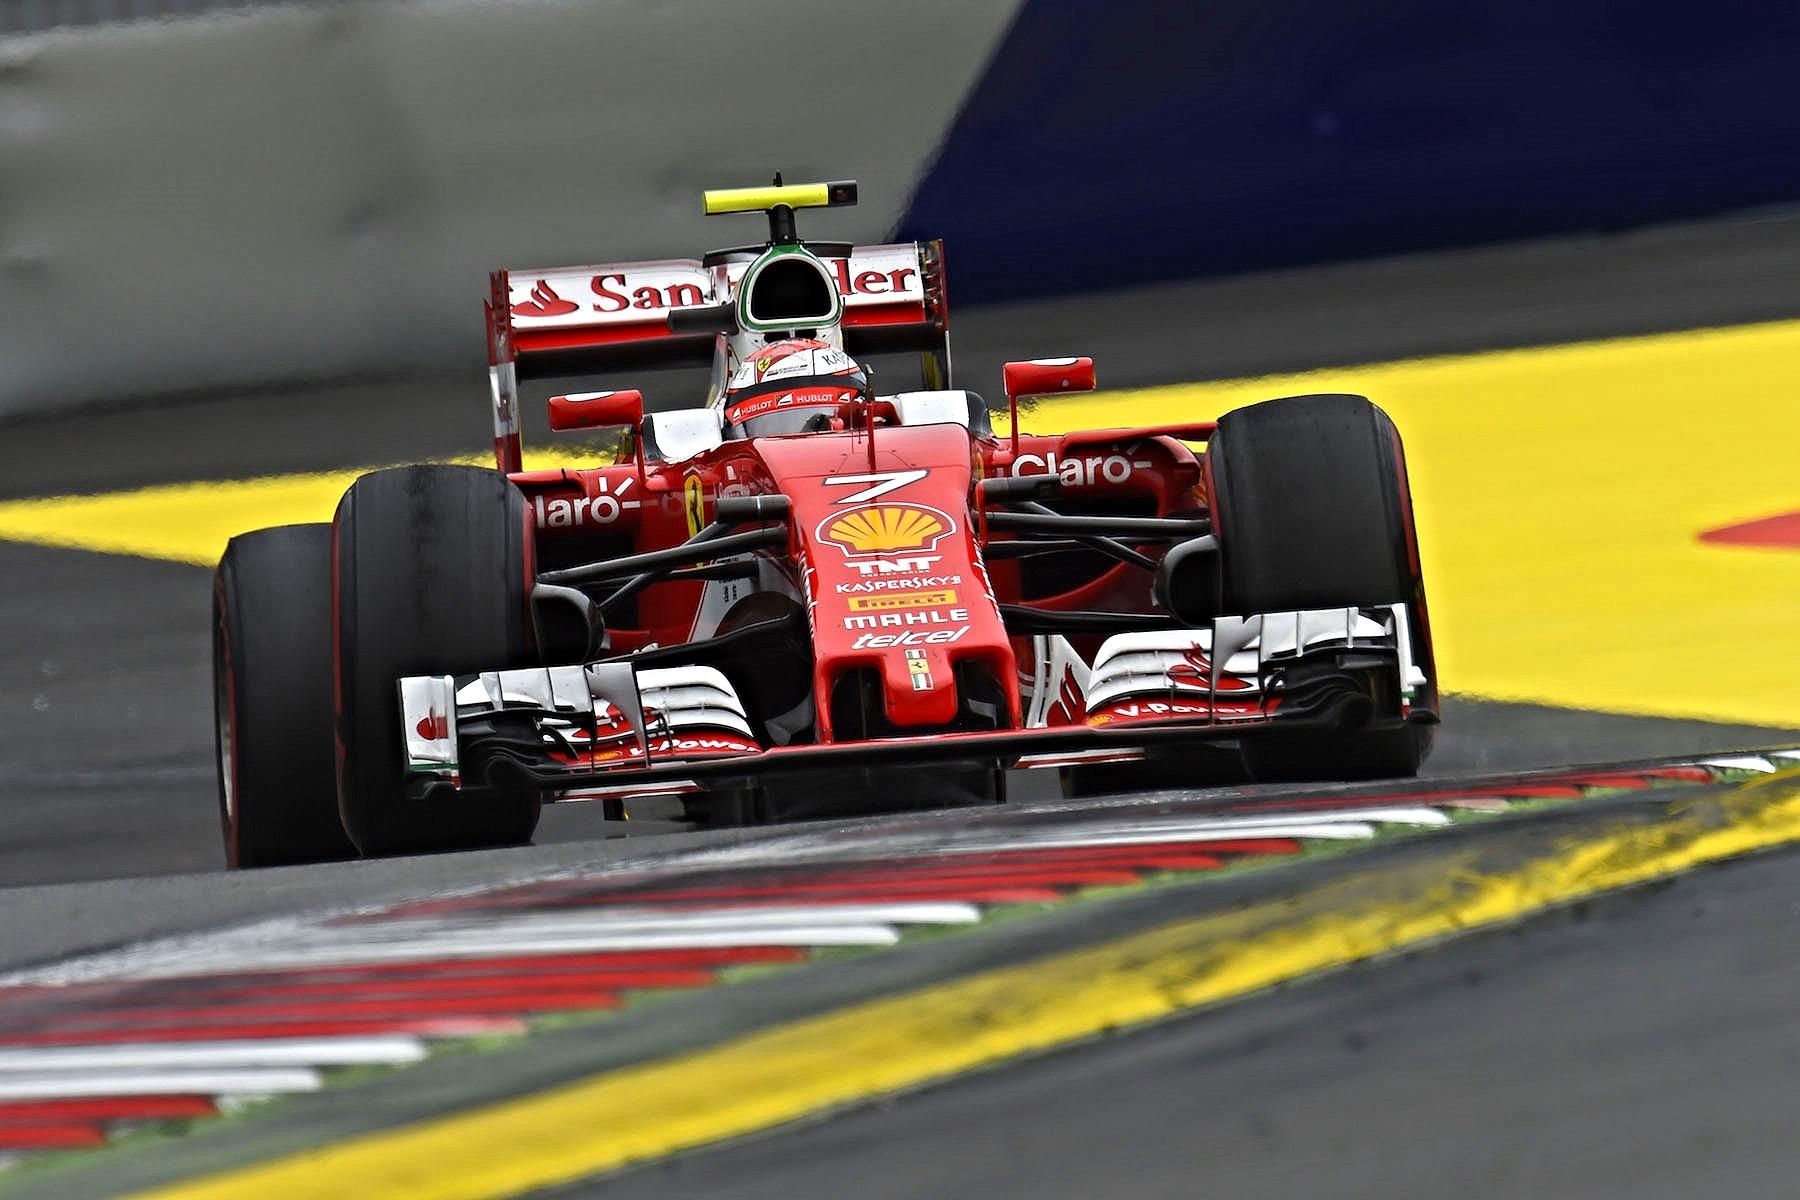 Salracing - Kimi Raikkonen | Ferrari SF16-H